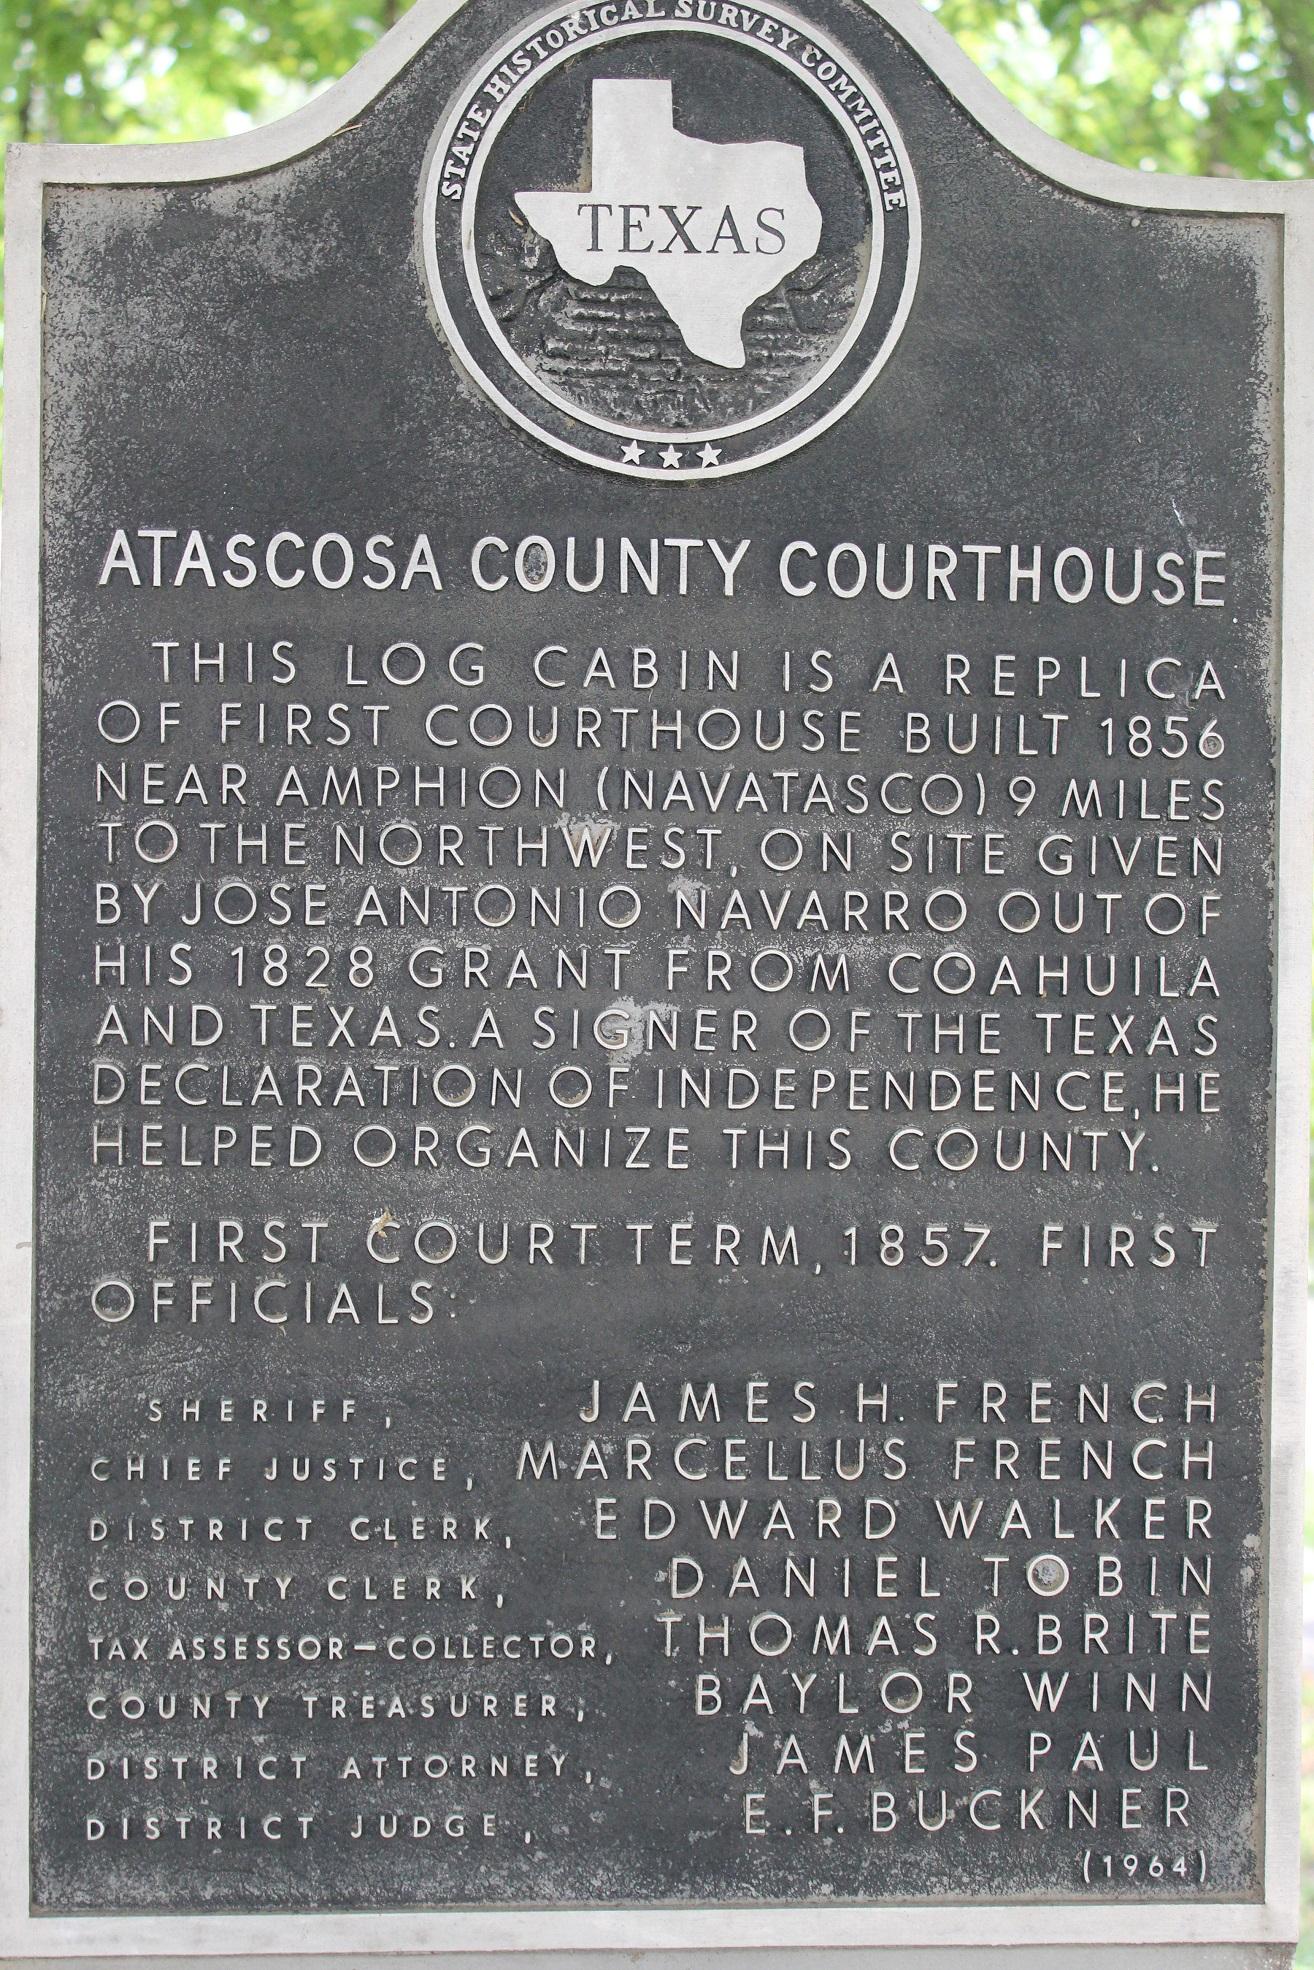 File:Atascosa-county-courthouse(log-cabin)2016-1.jpg - Wikimedia Commons